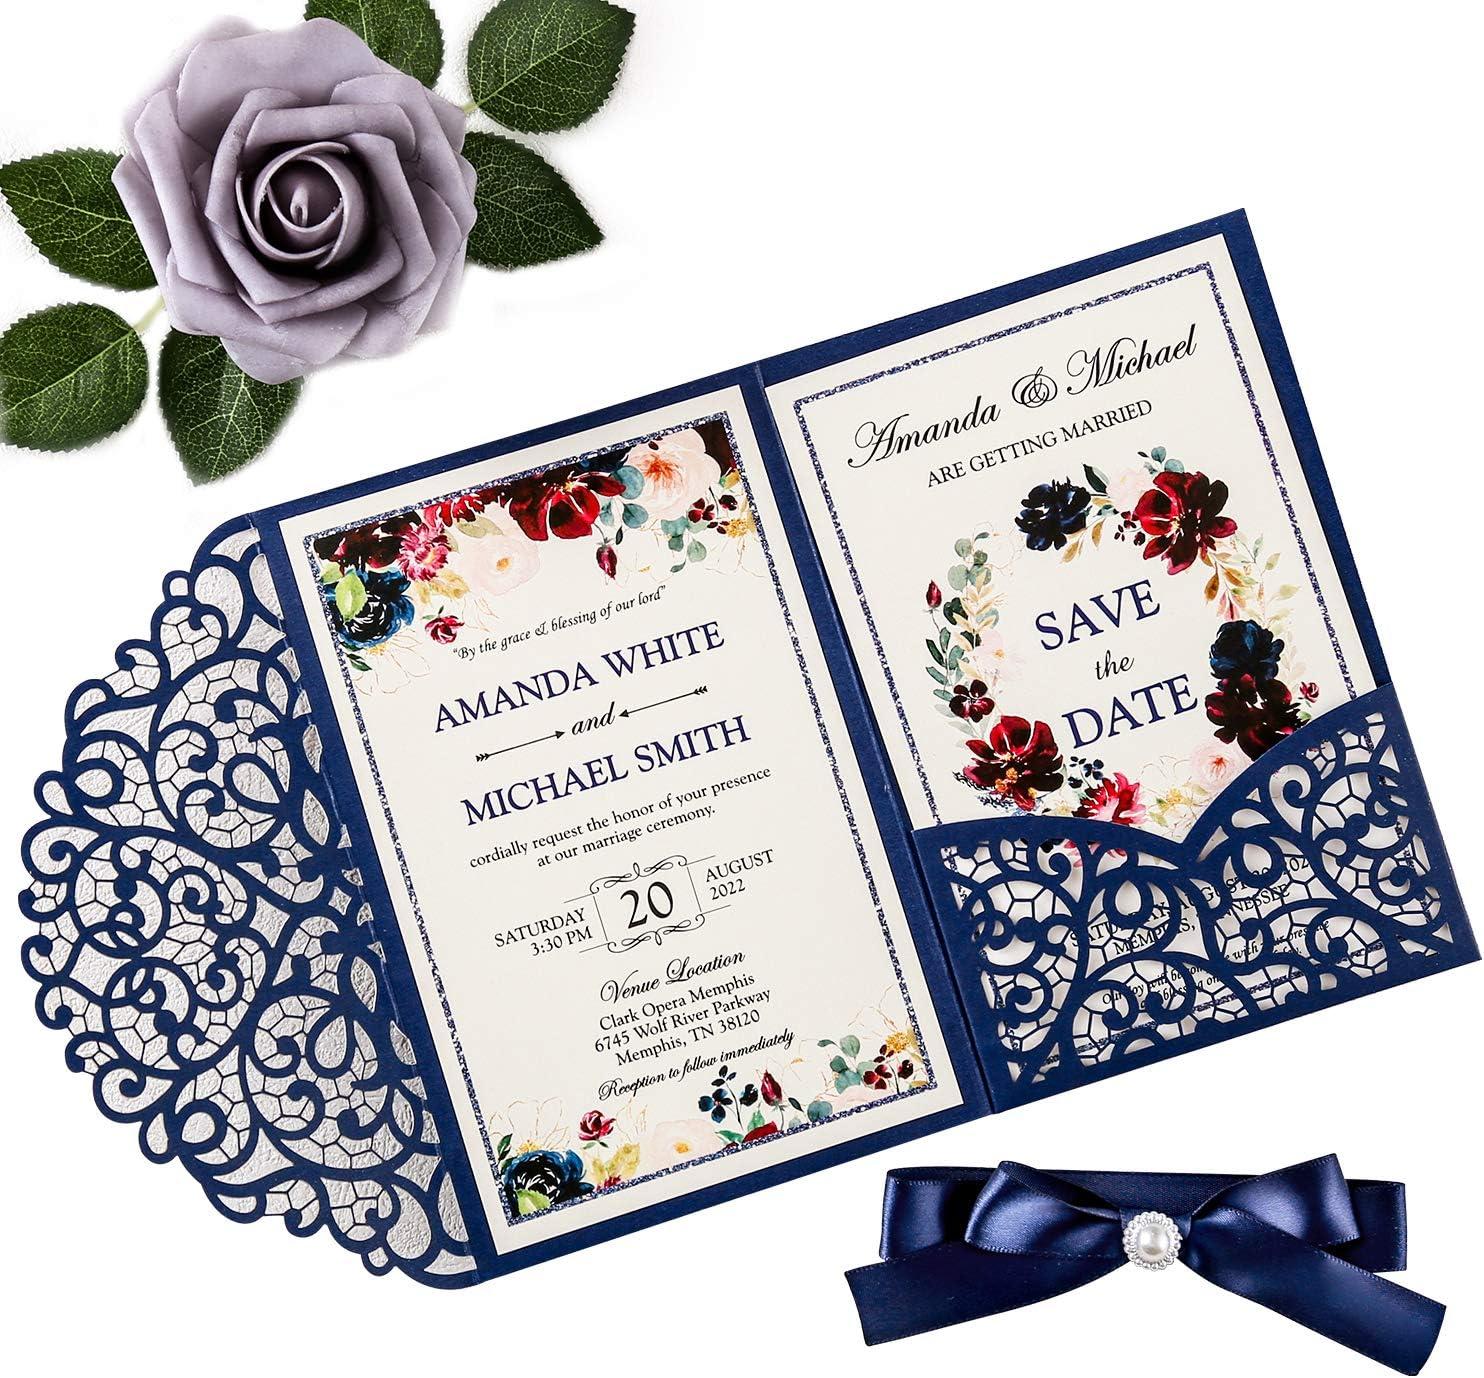 Doris Home 4.7 x7 inch 50PCS Blank Navy Blue Wedding Invitations Kits Laser Cut Hollow Rose Pocket Wedding Invitation Cards with Envelopes for Wedding Bridal Shower Engagement Invite